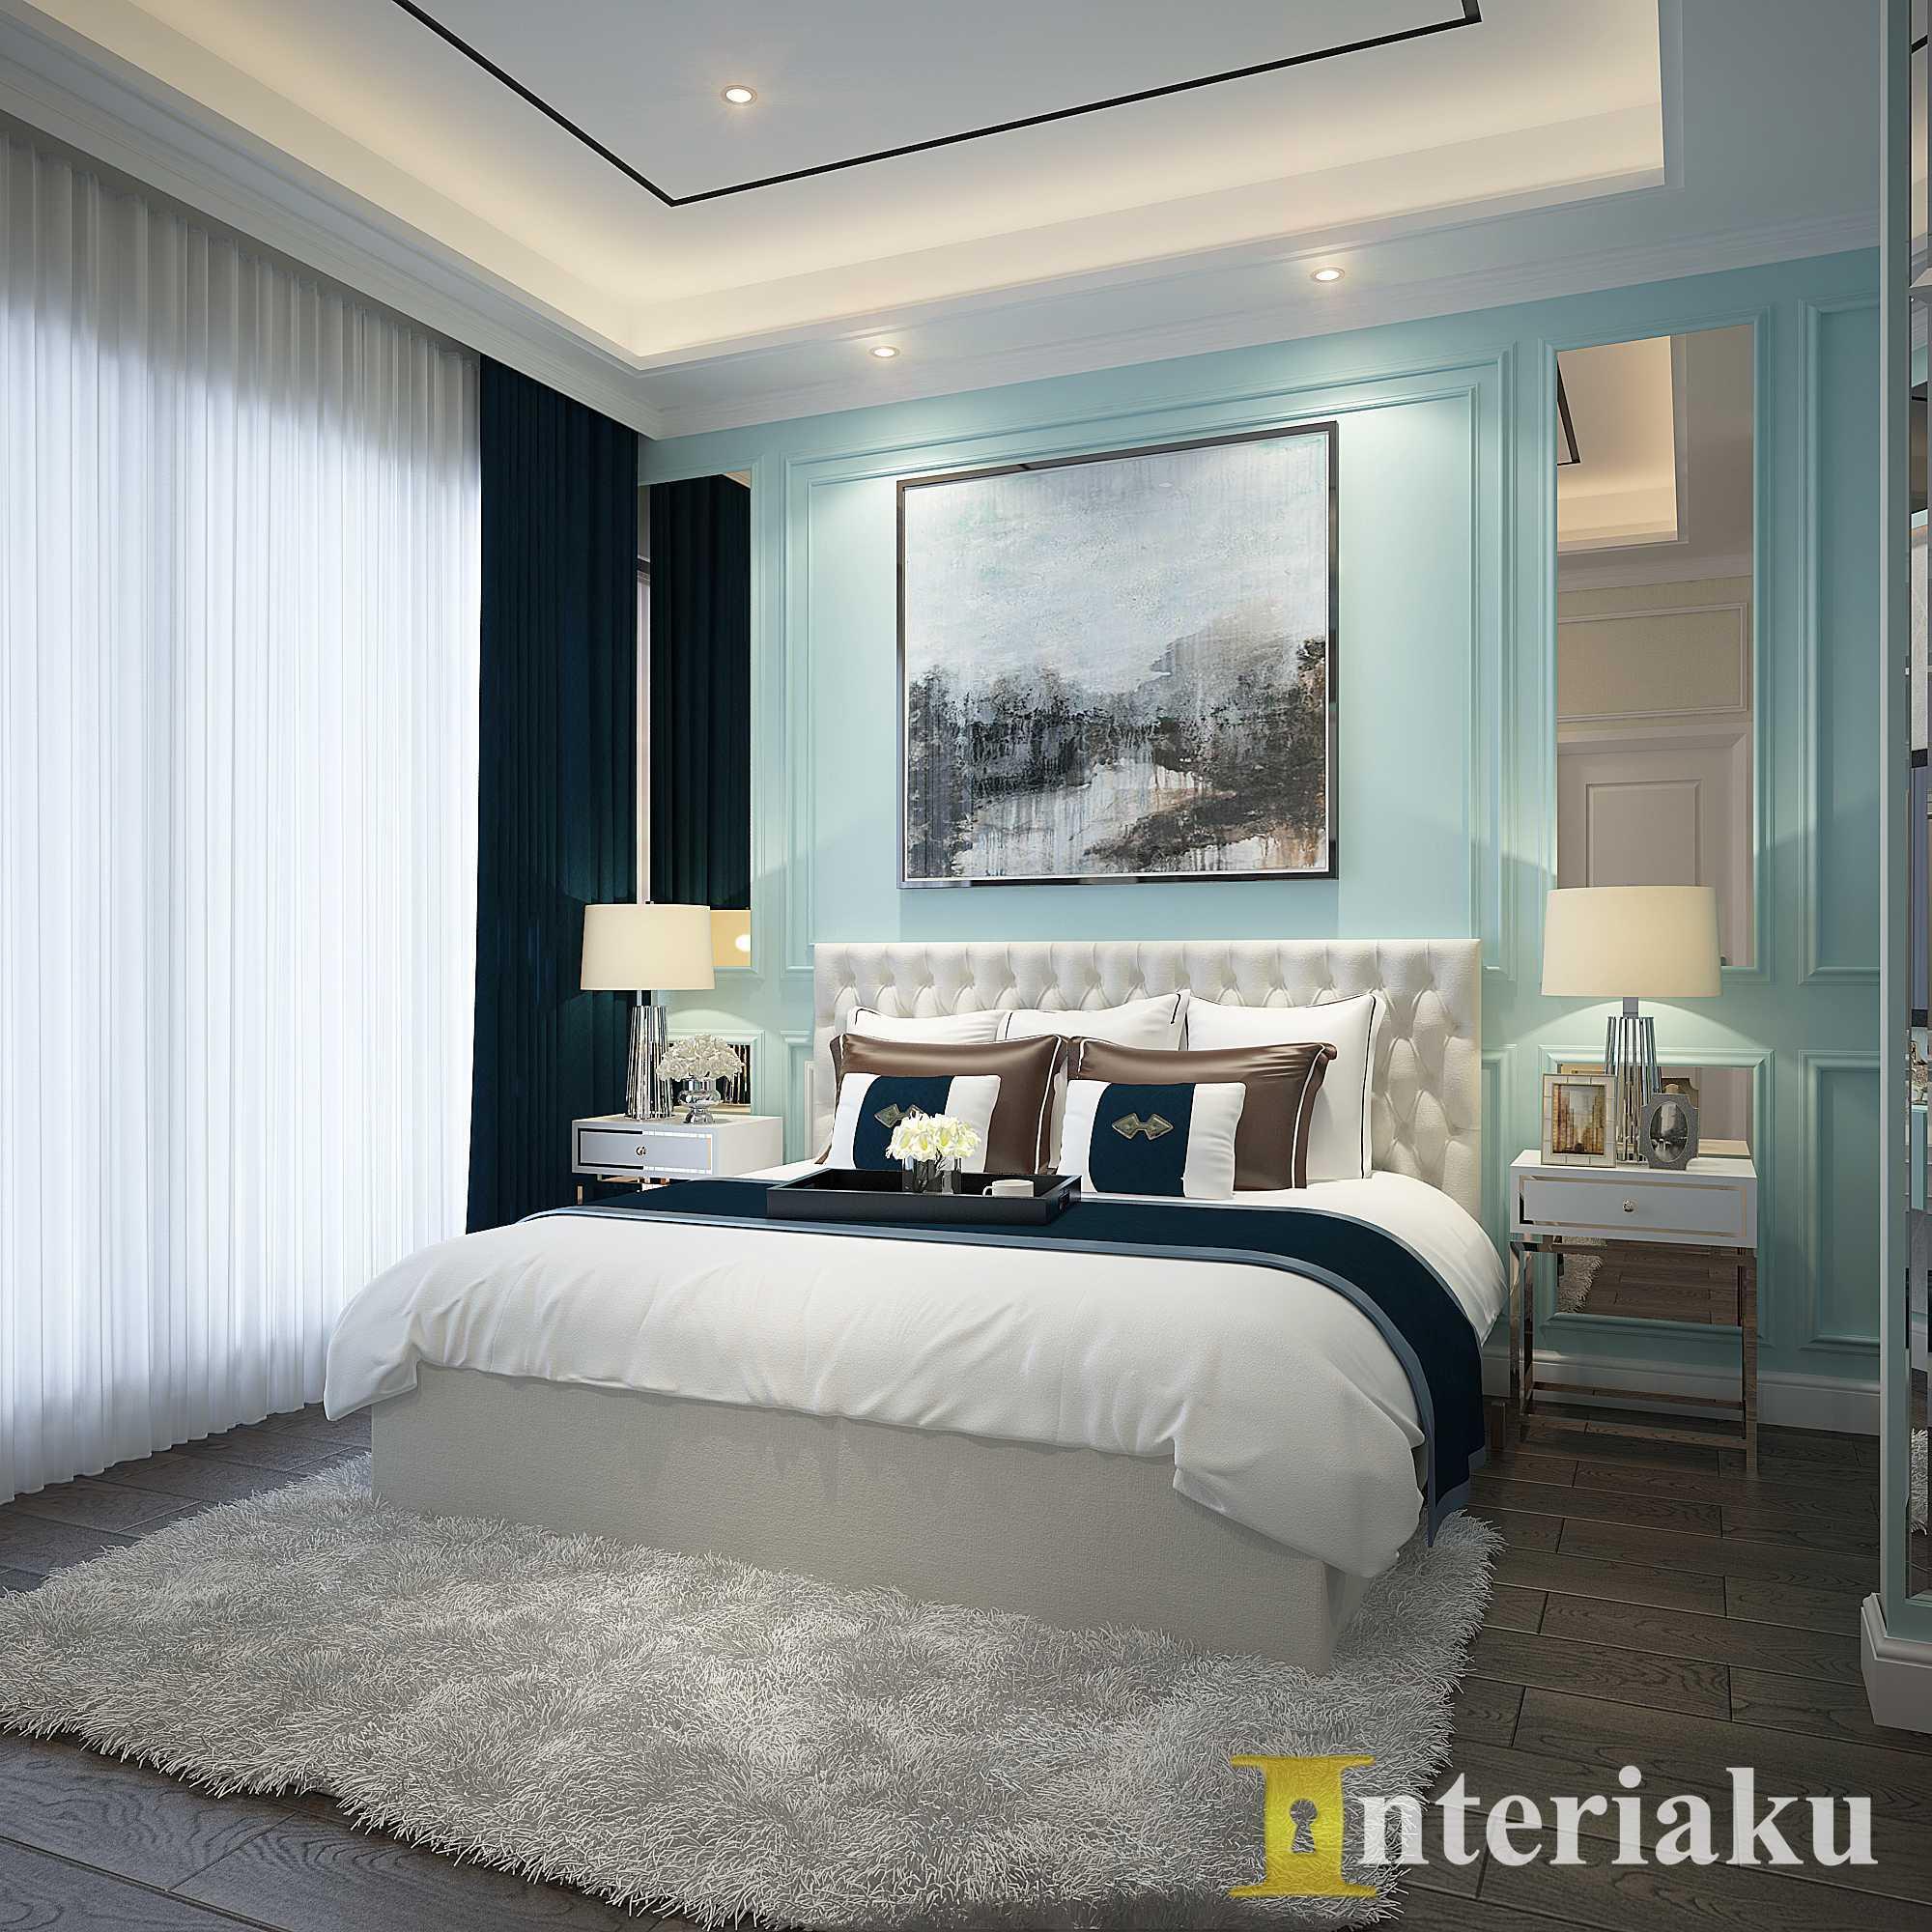 Interiaku Classic Minimalist Bedroom Kabupaten Ciamis, Jawa Barat, Indonesia Kabupaten Ciamis, Jawa Barat, Indonesia Interiaku-Classic-Minimalist-Bedroom  67913